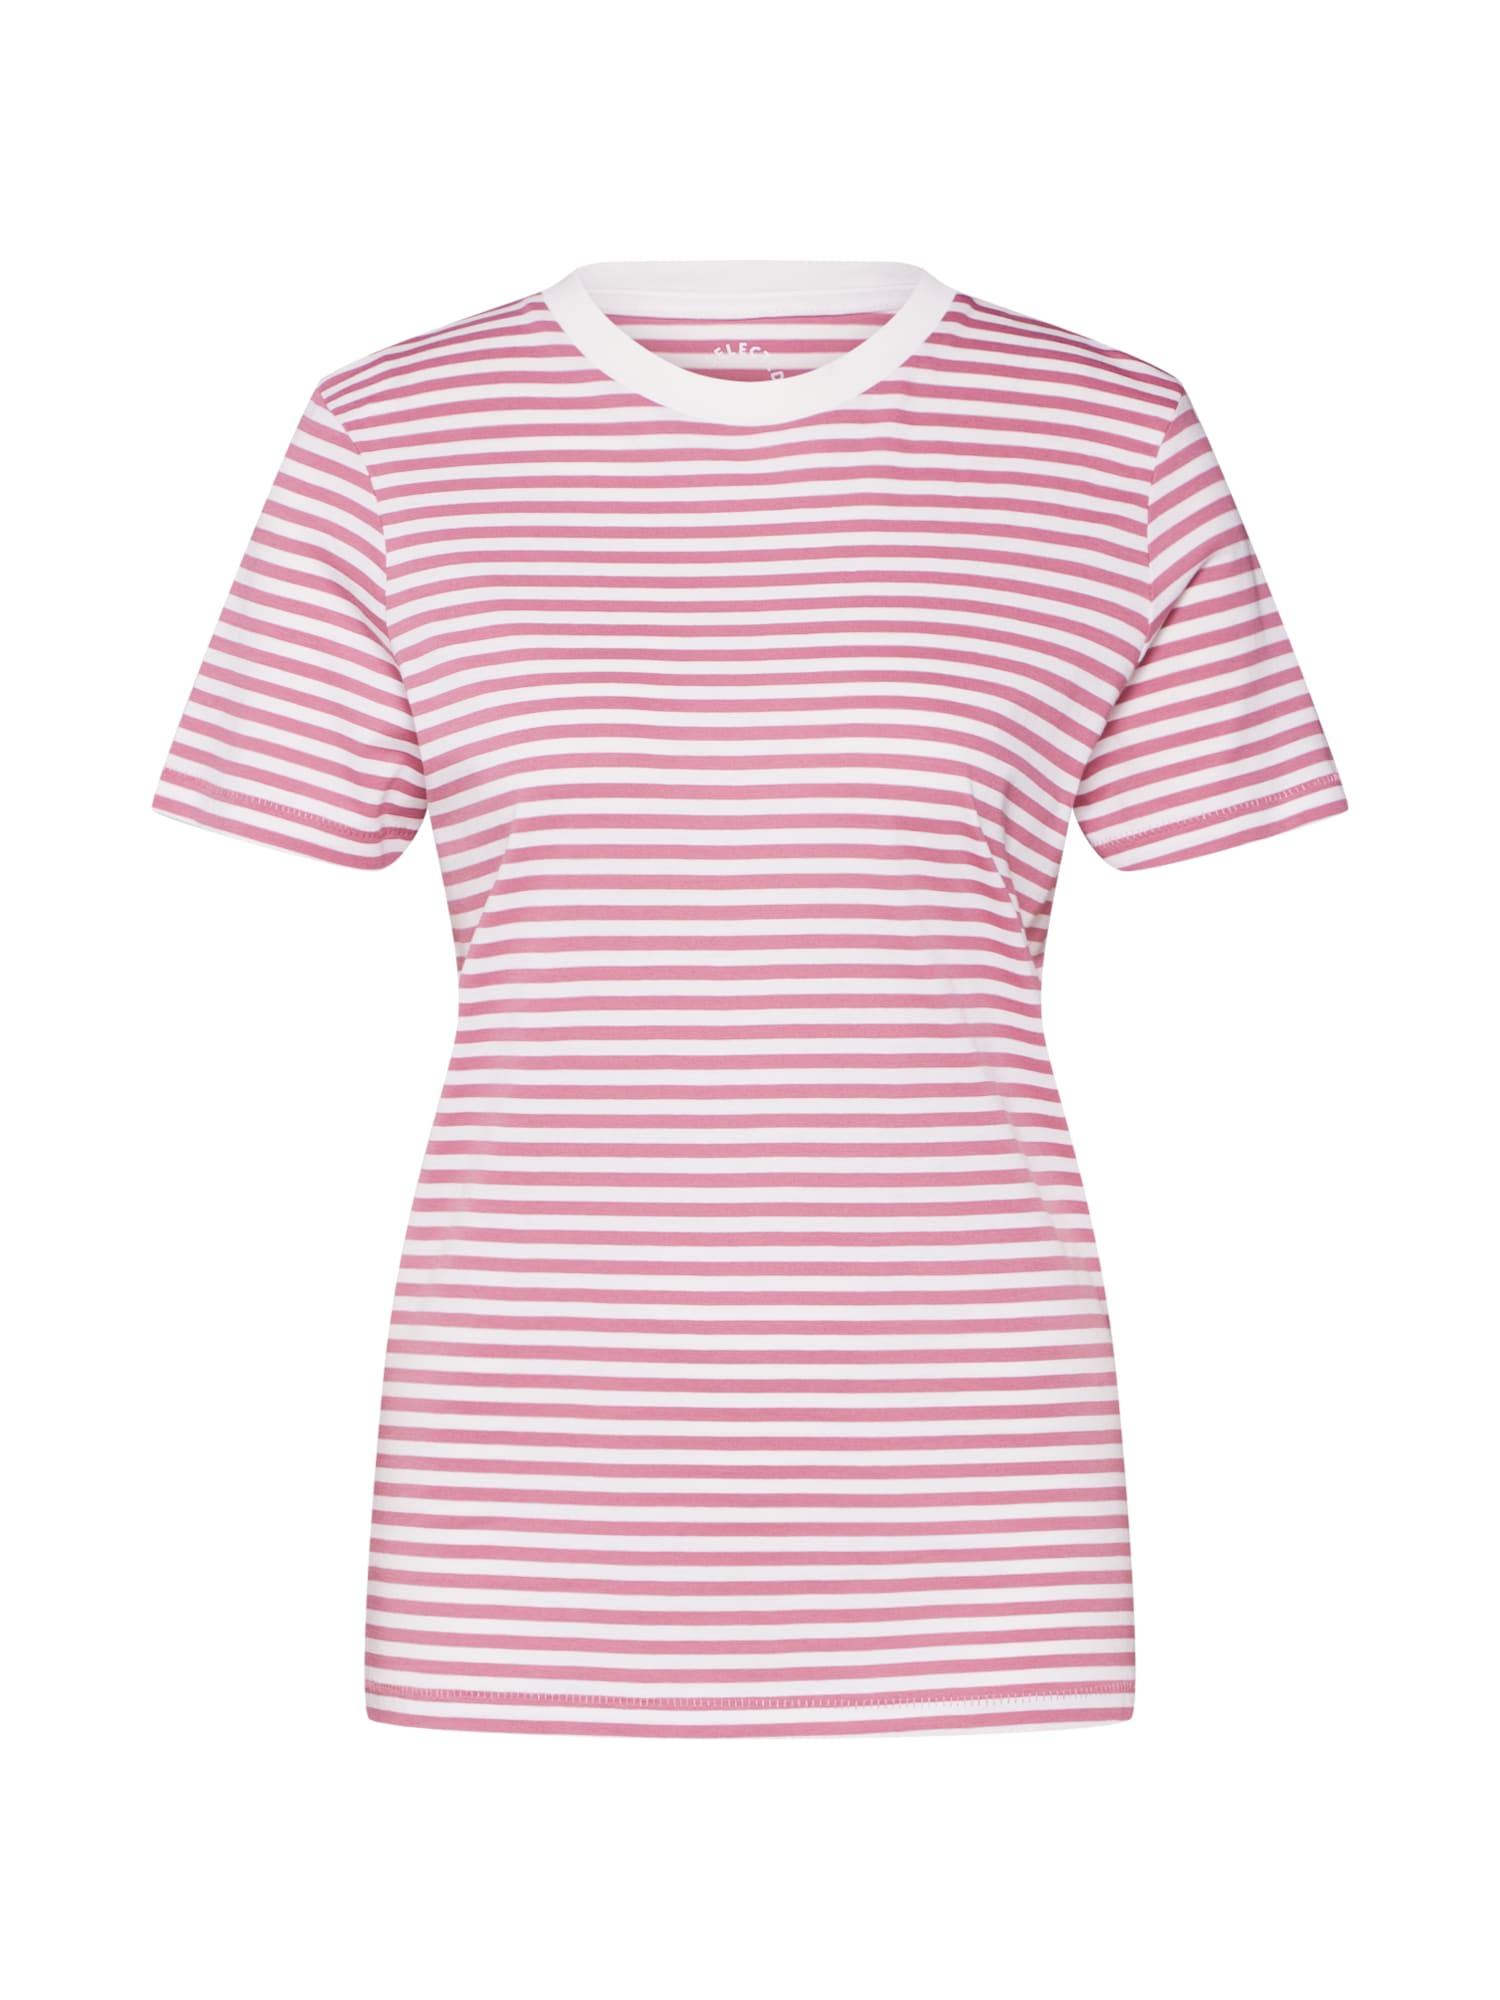 SELECTED FEMME Tričko  biela / ružová